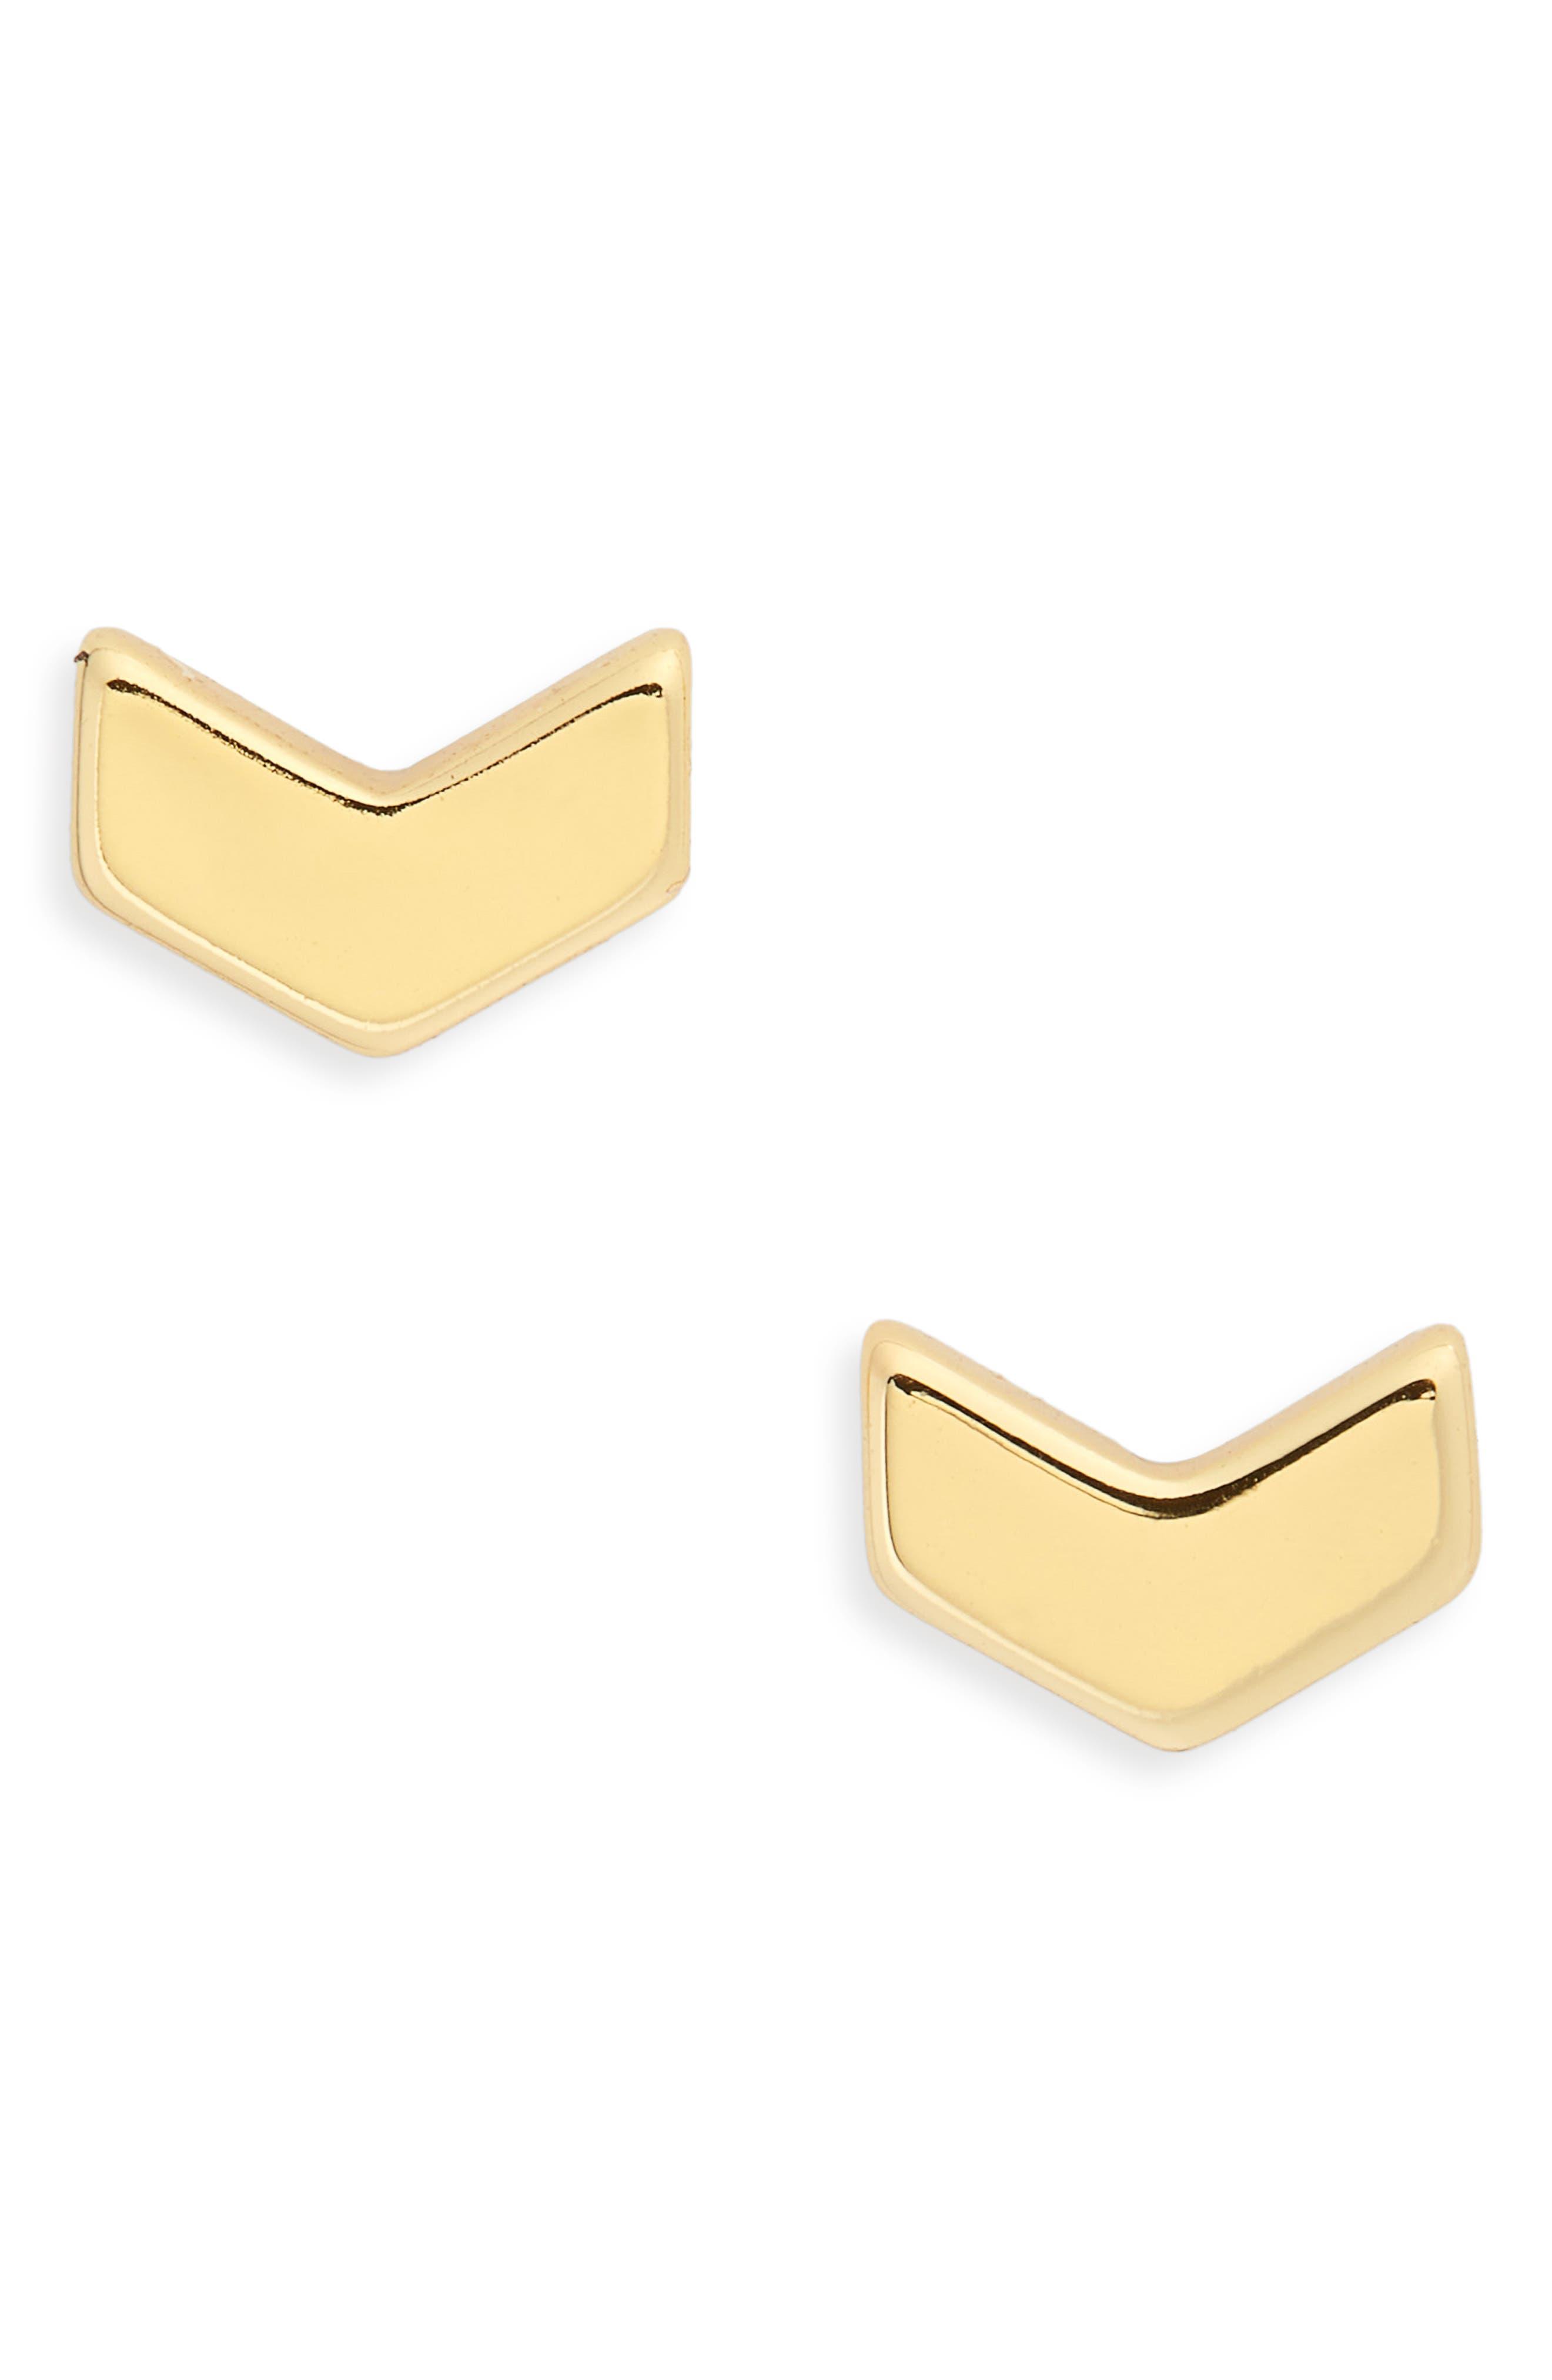 Venice Chevron Stud Earrings